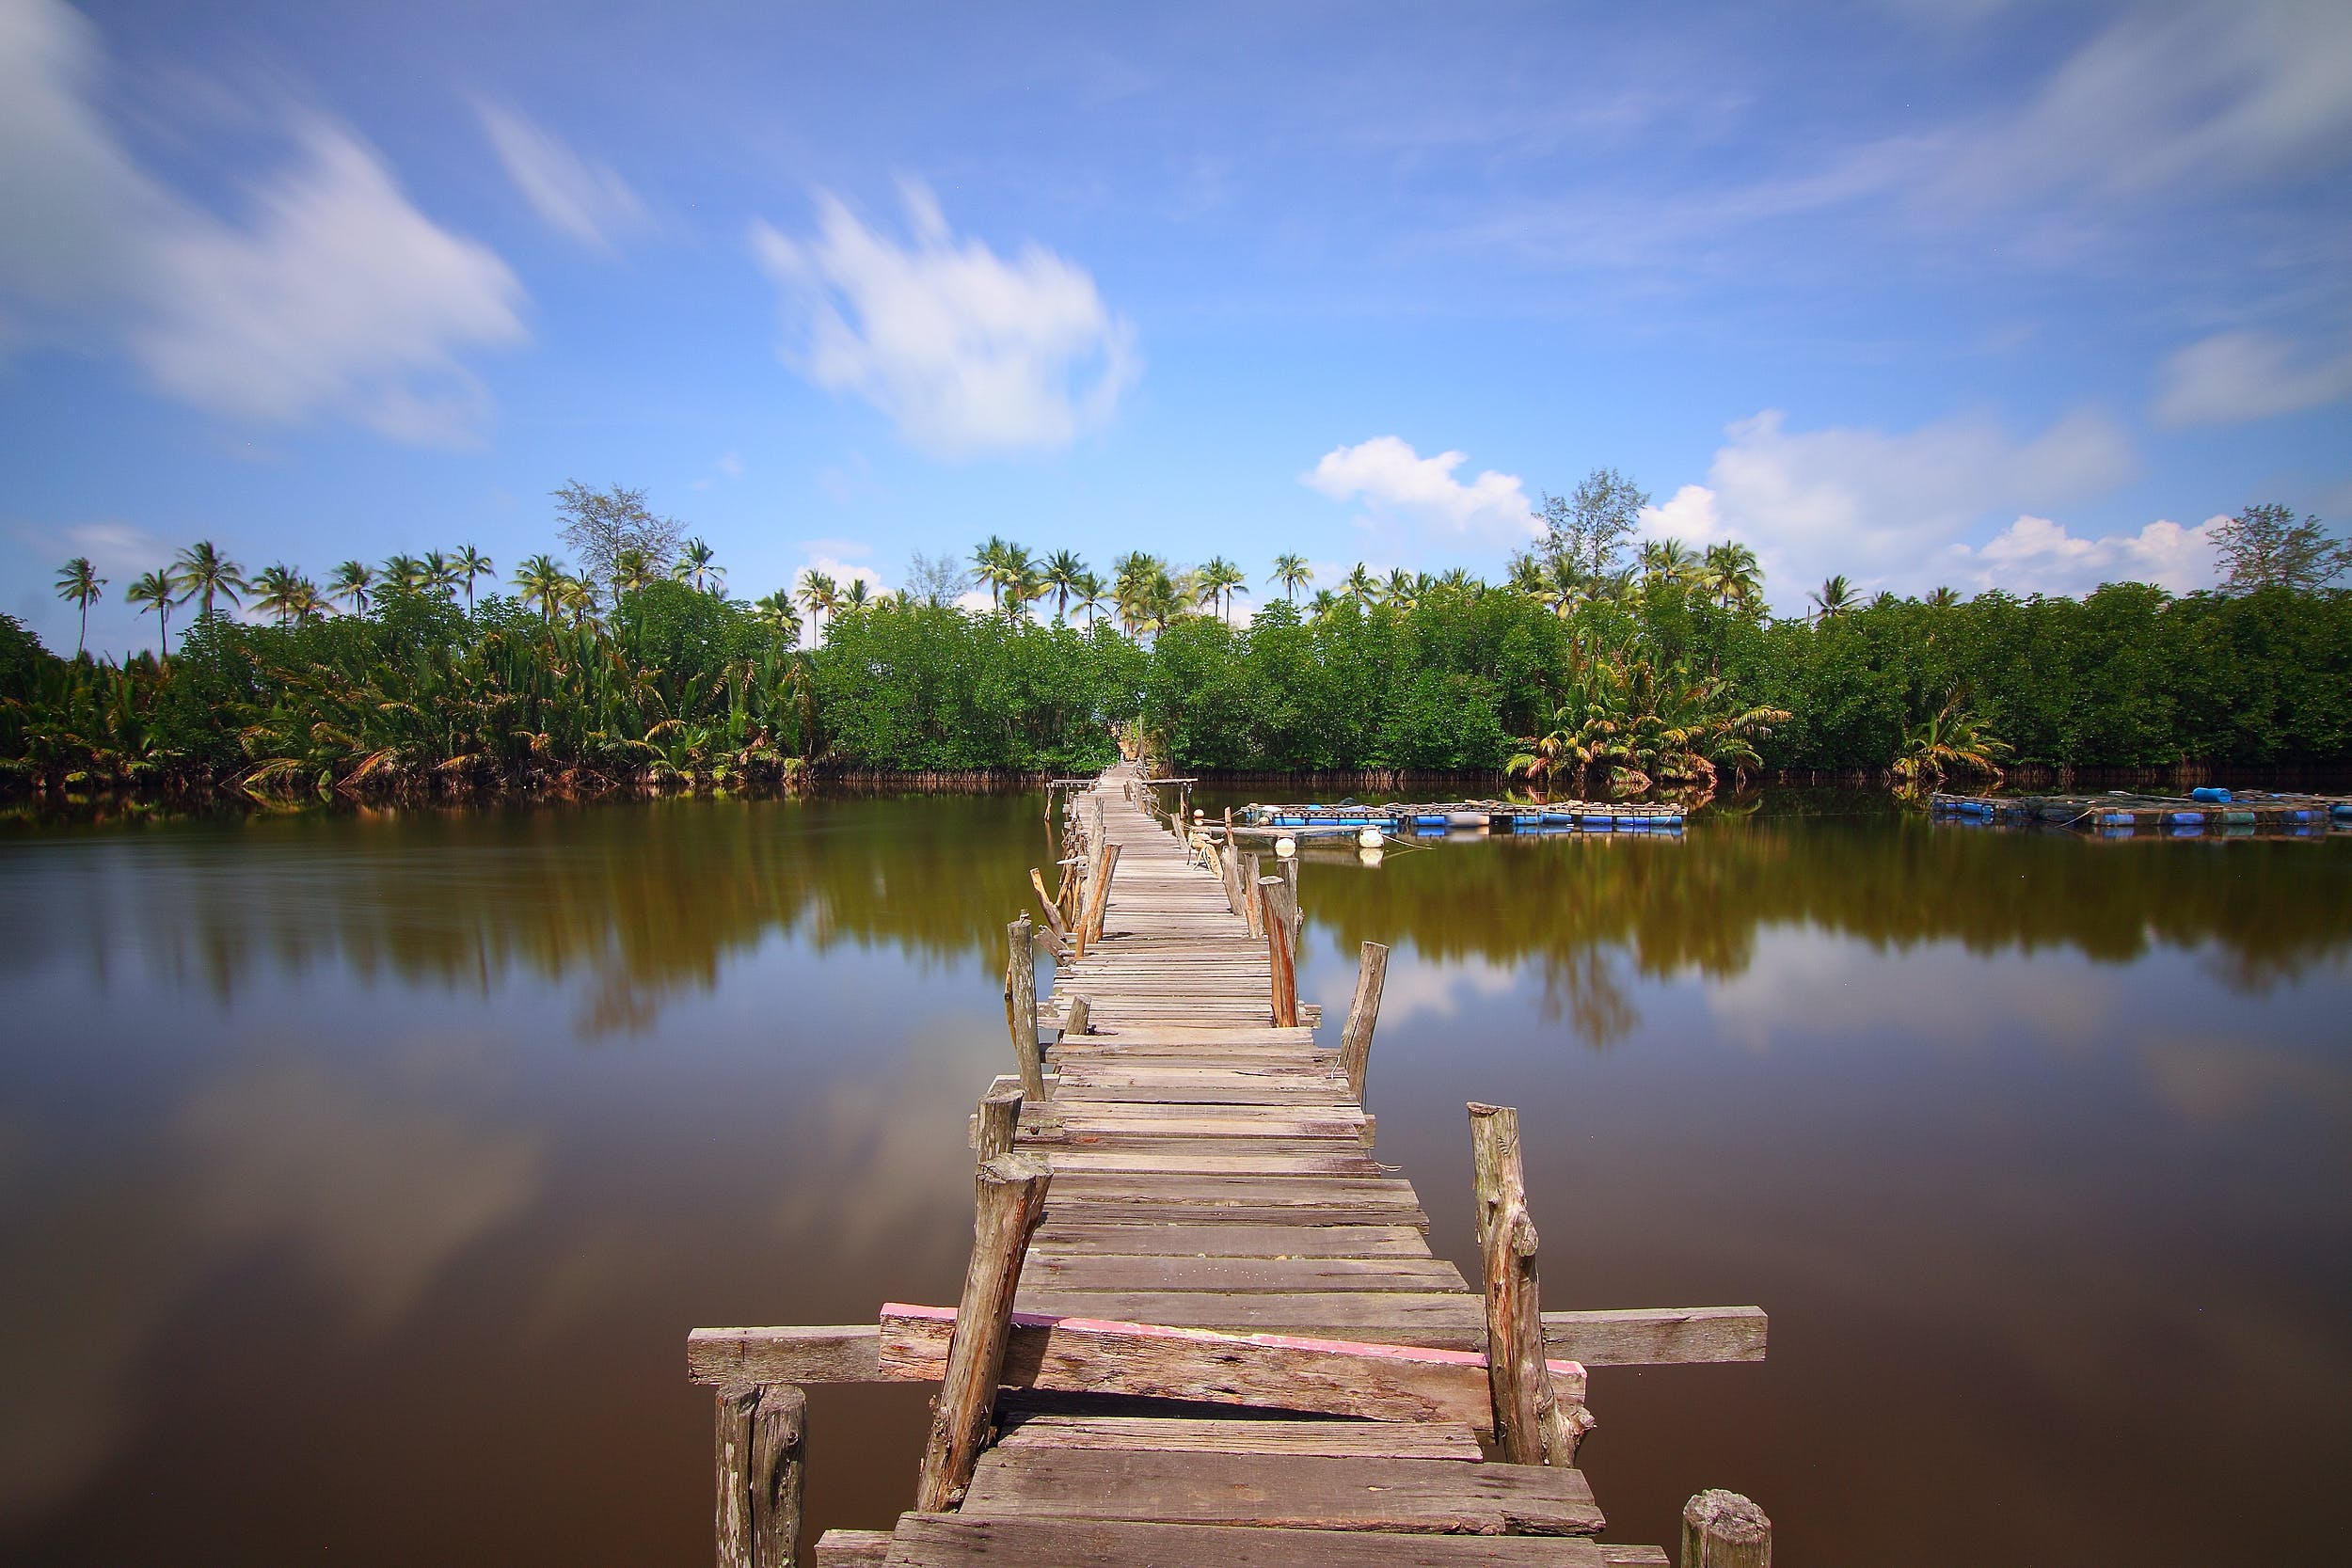 bridge, lake, outdoors